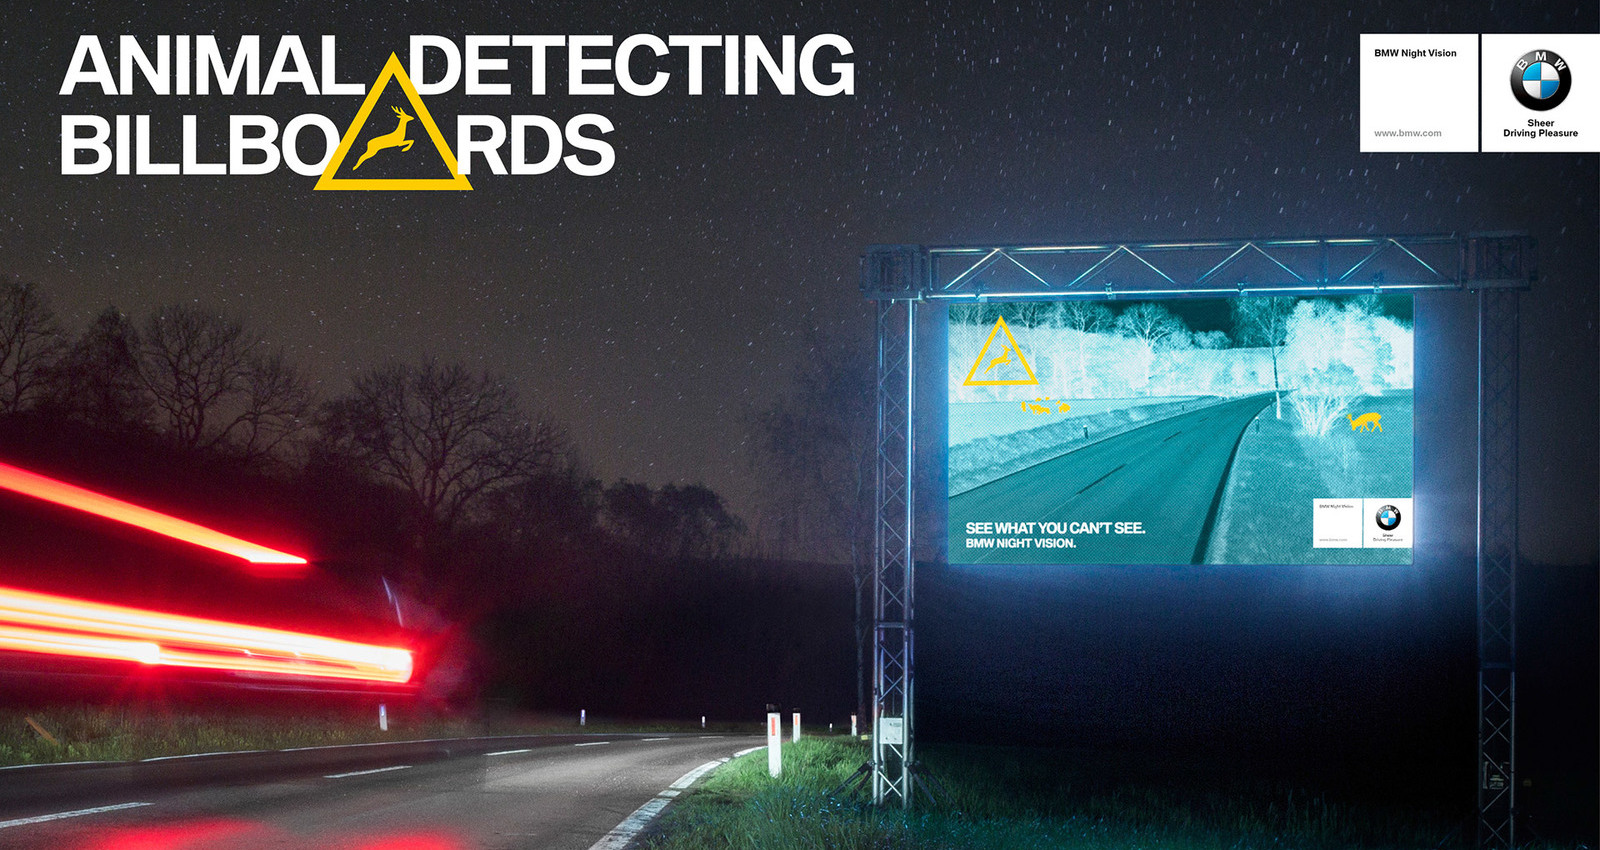 Animal Detecting Billboards